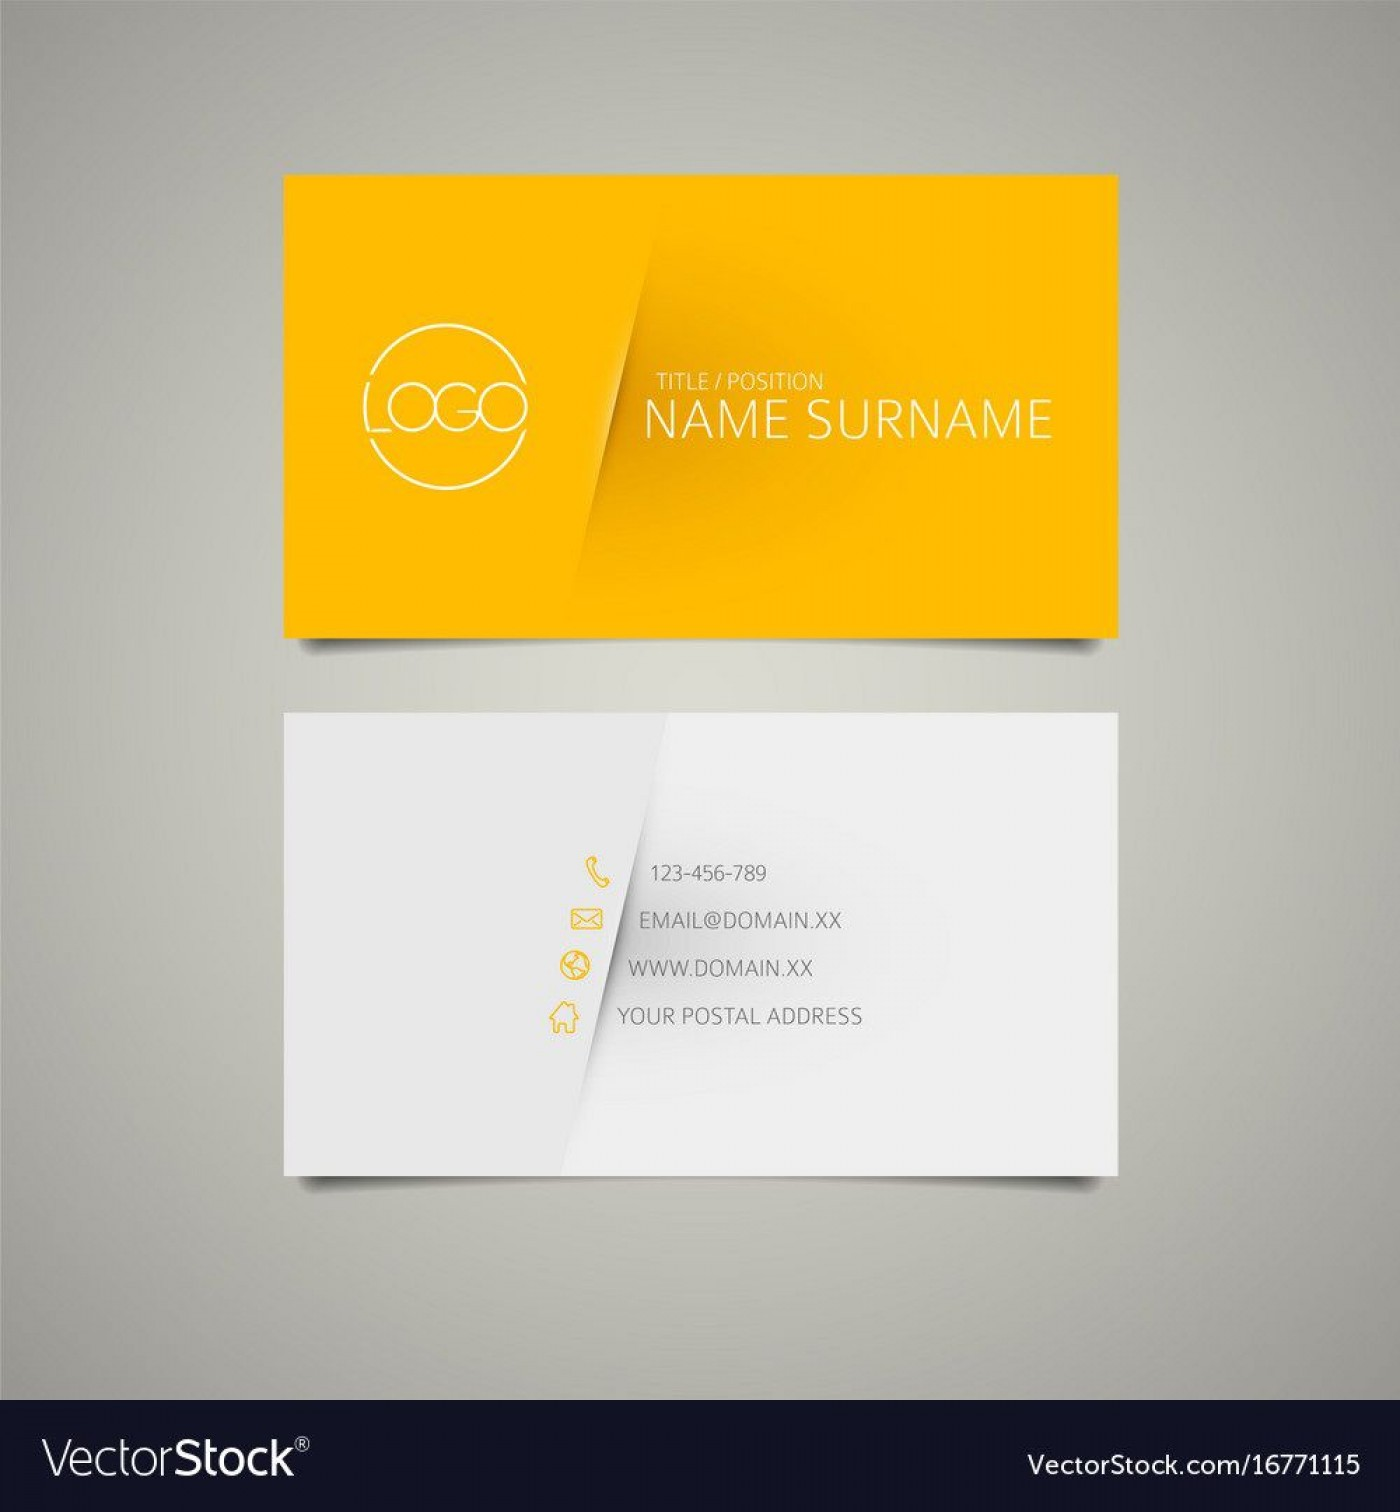 009 Unforgettable Simple Busines Card Template Free Idea  Minimalist Illustrator Design1400